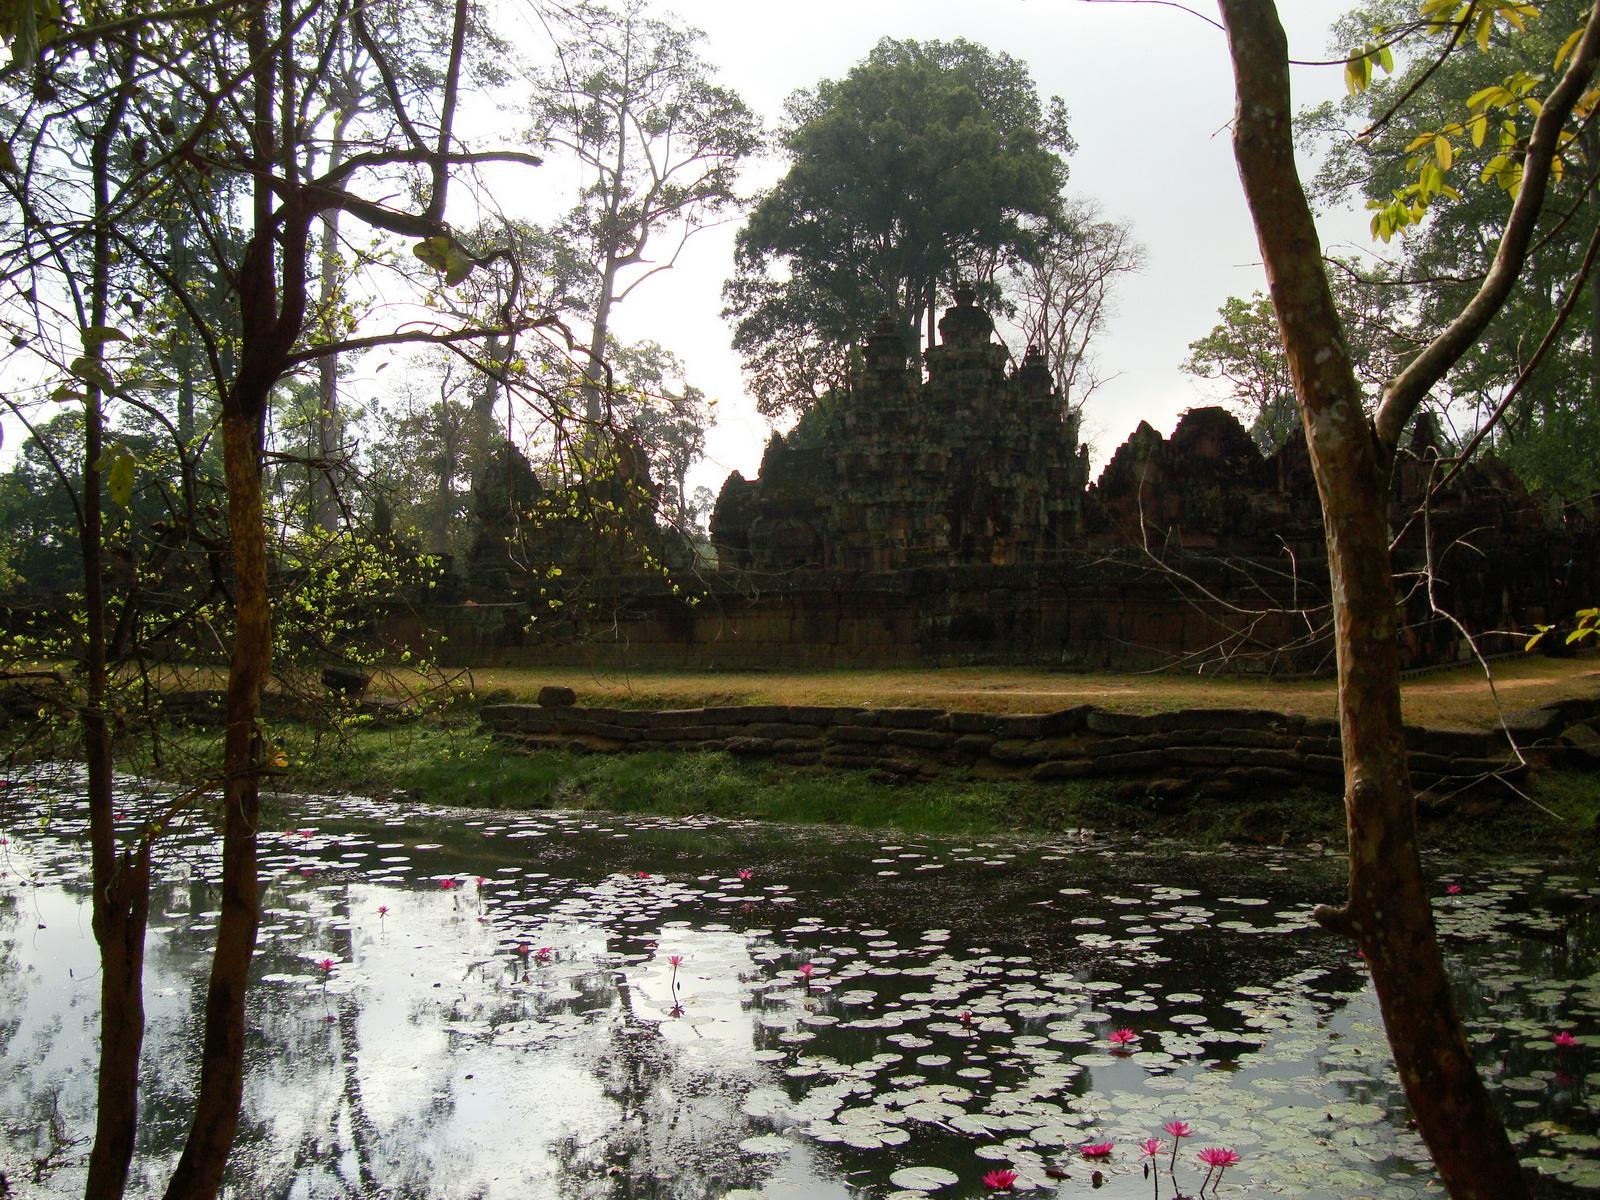 Banteay Srei 10th century Khmer architecture Tribhuvanamahesvara 12